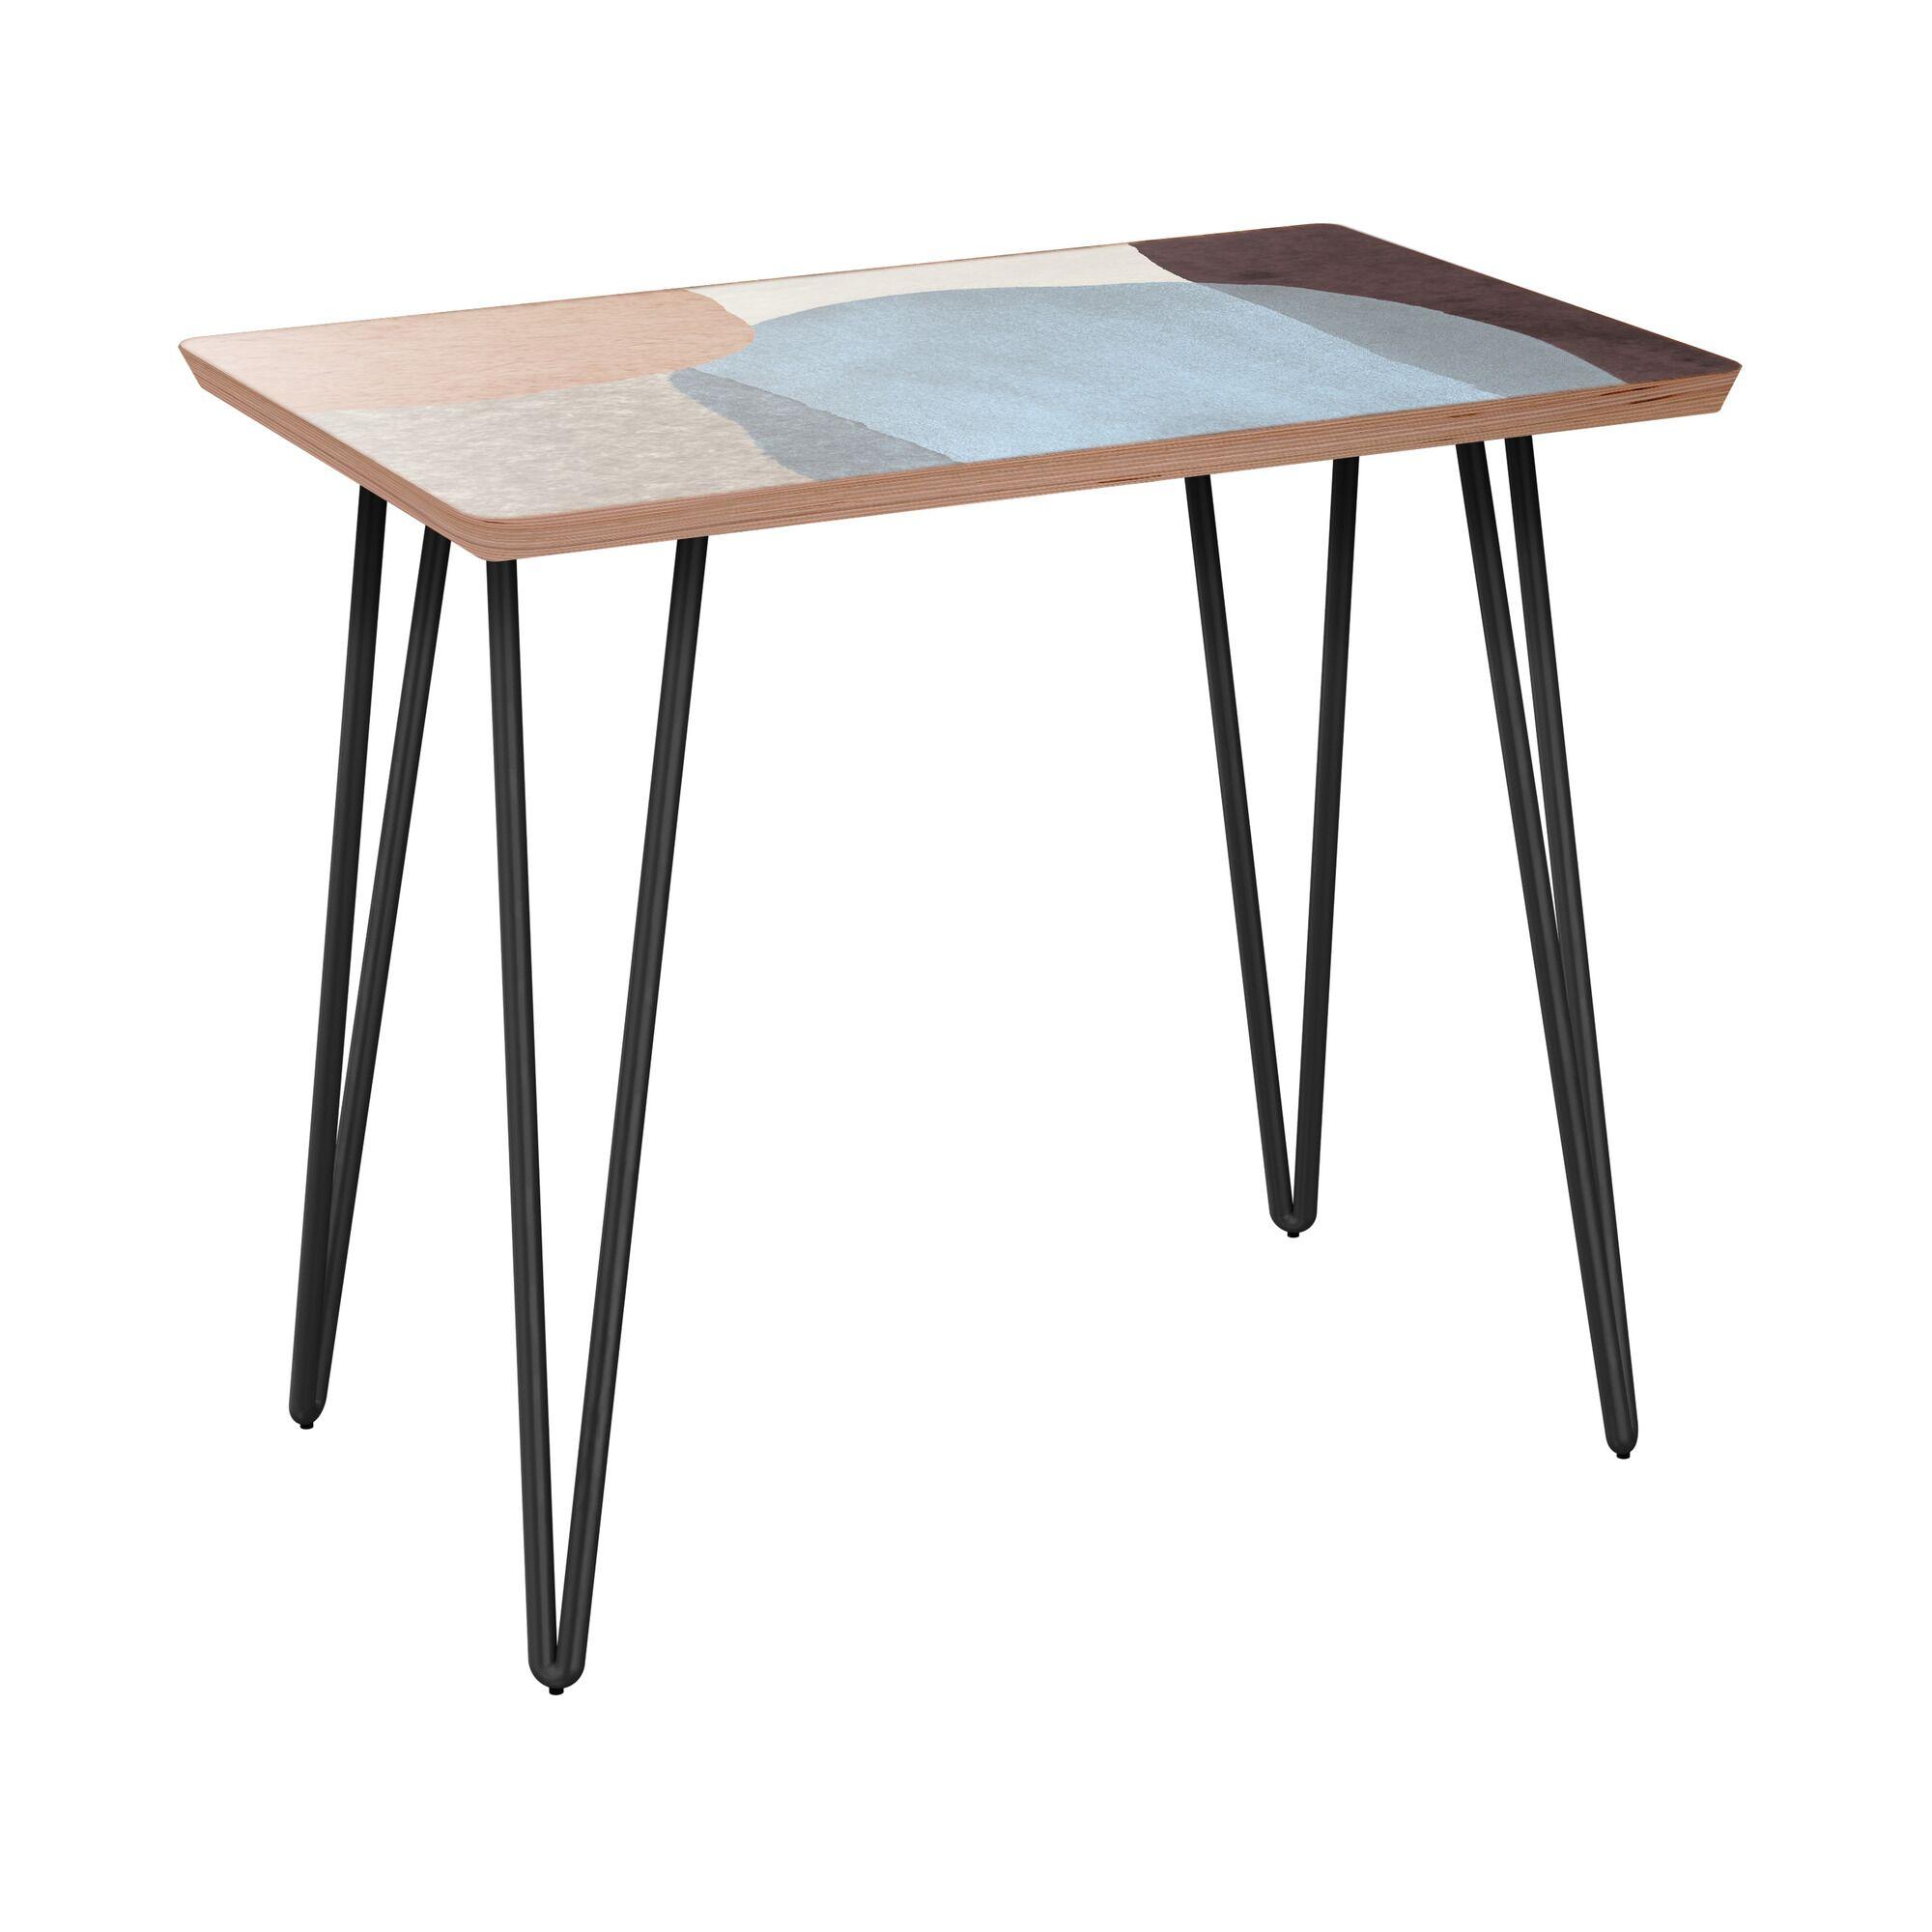 Failand End Table Table Base Color: Black, Table Top Color: Walnut